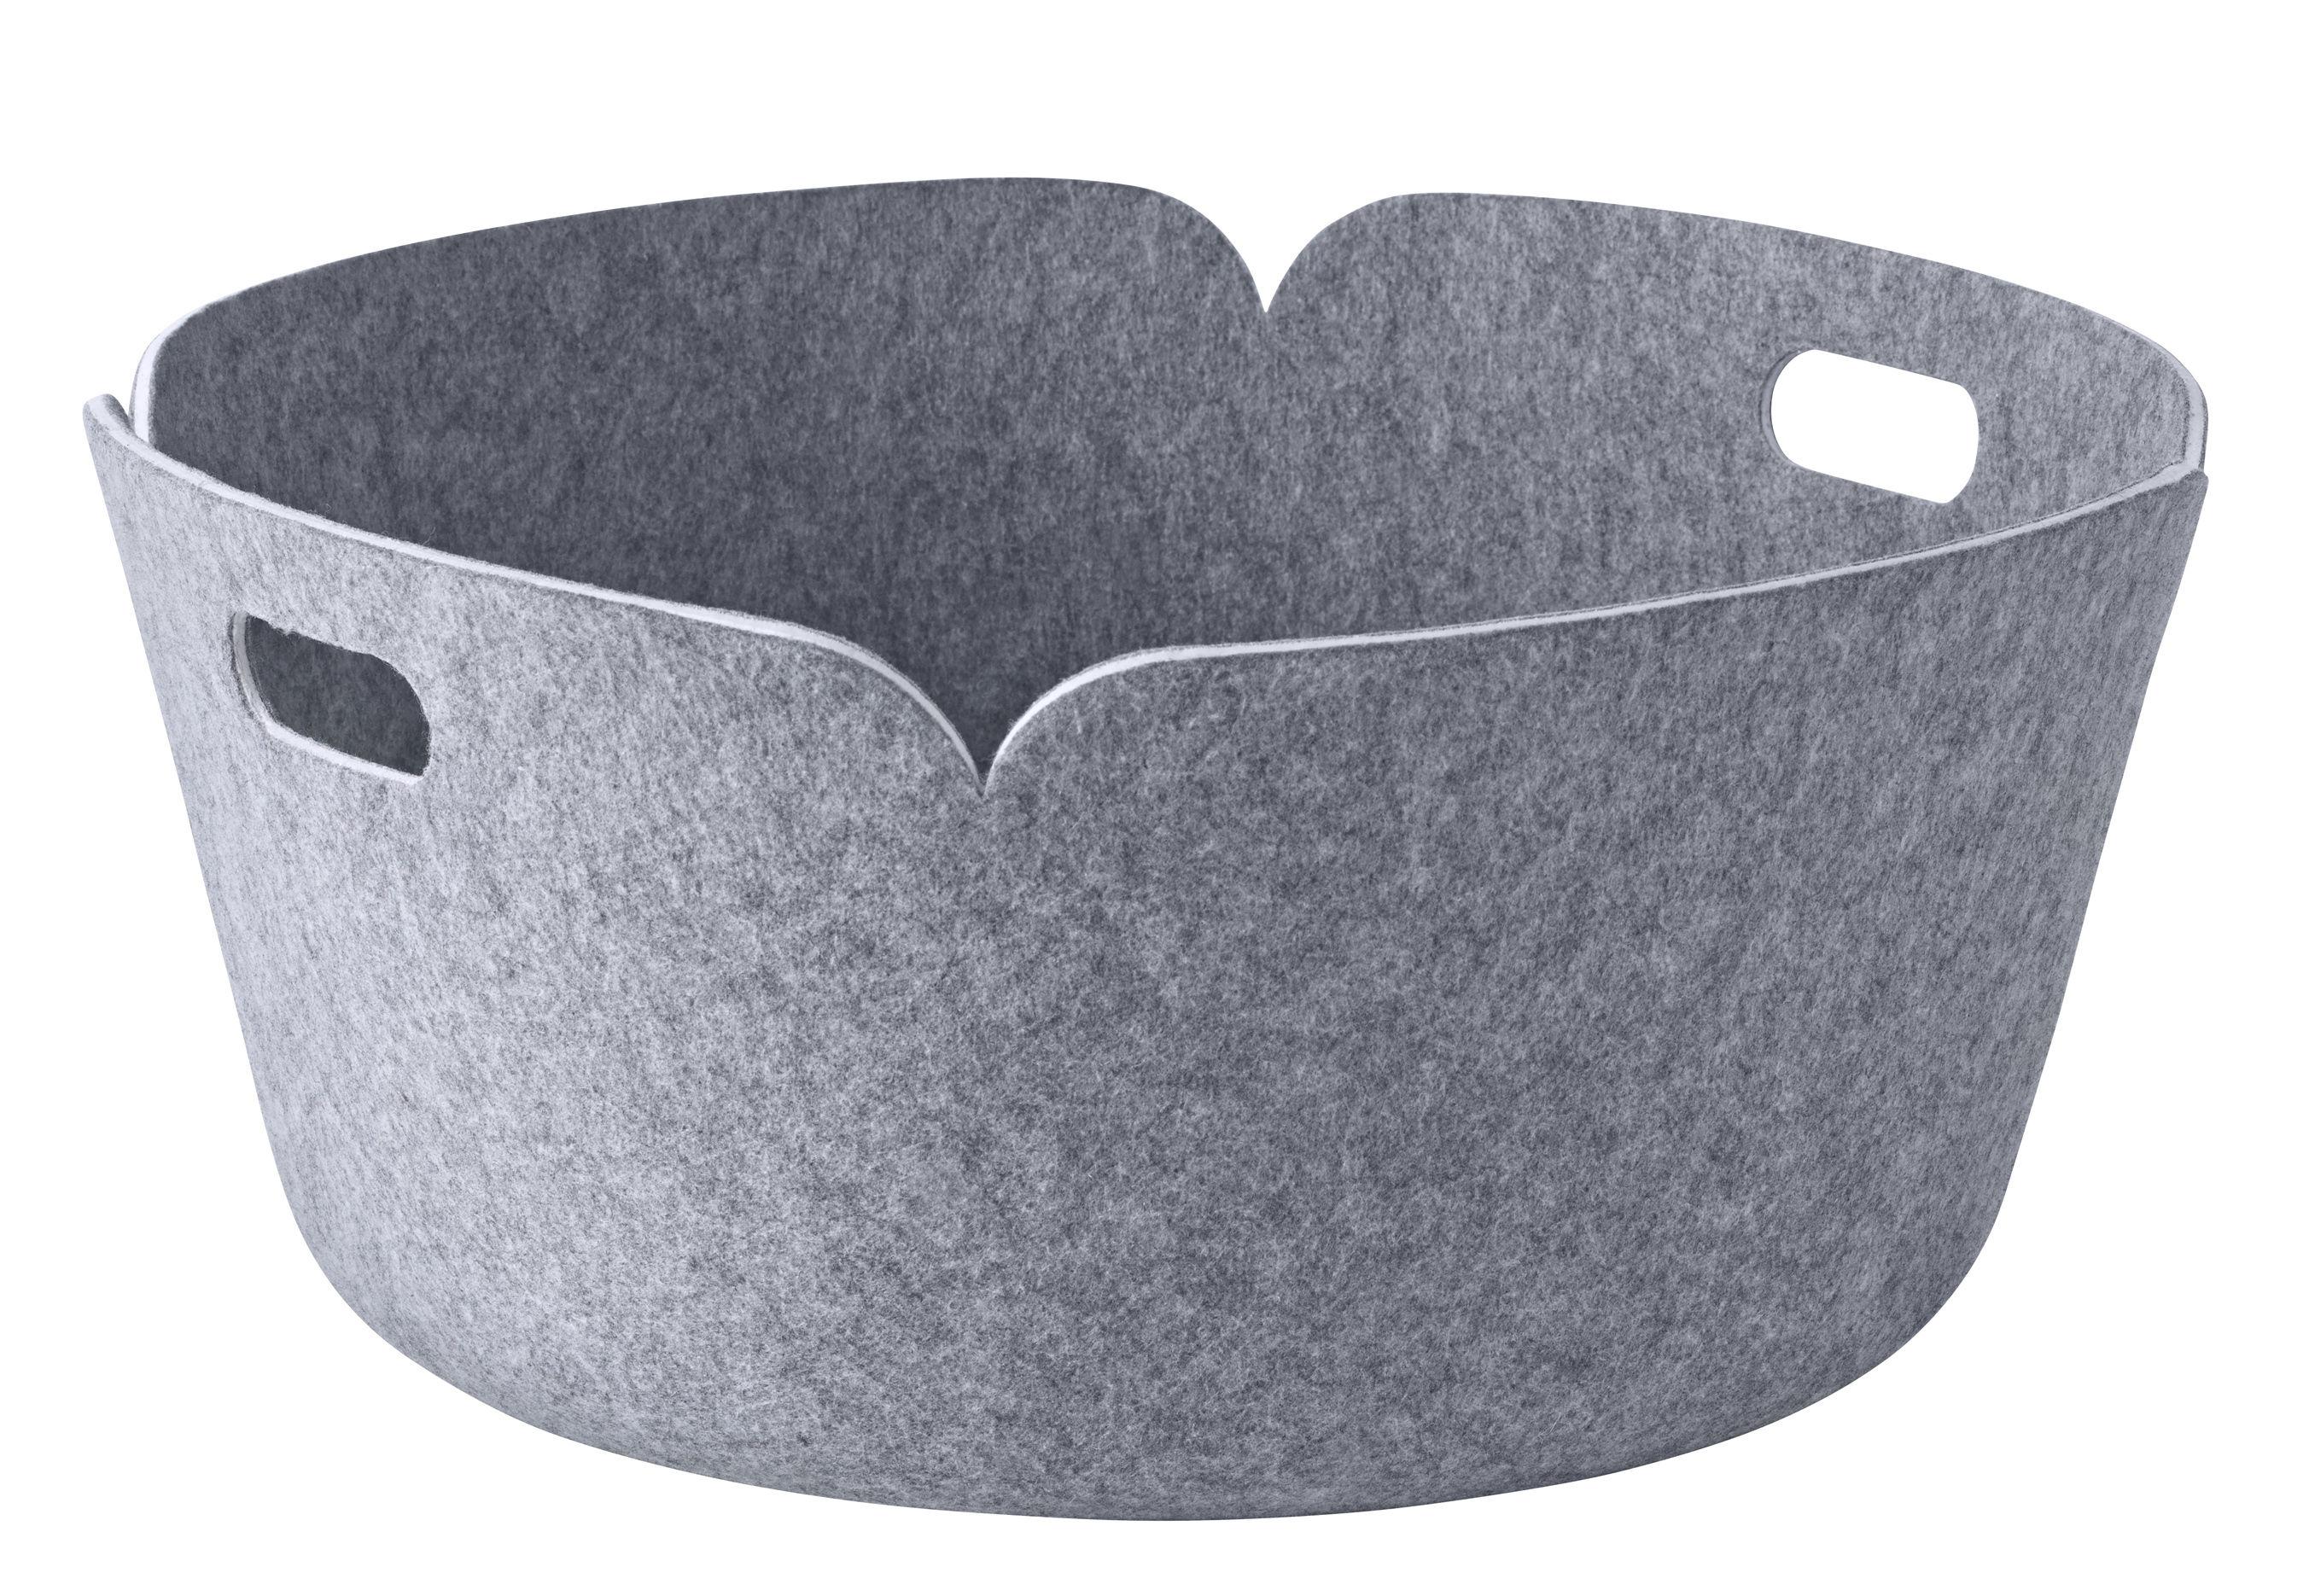 Decoration - Centrepieces & Centrepiece Bowls - Restore Basket - Round - Ø 52 cm by Muuto - Grey - Recycled felt